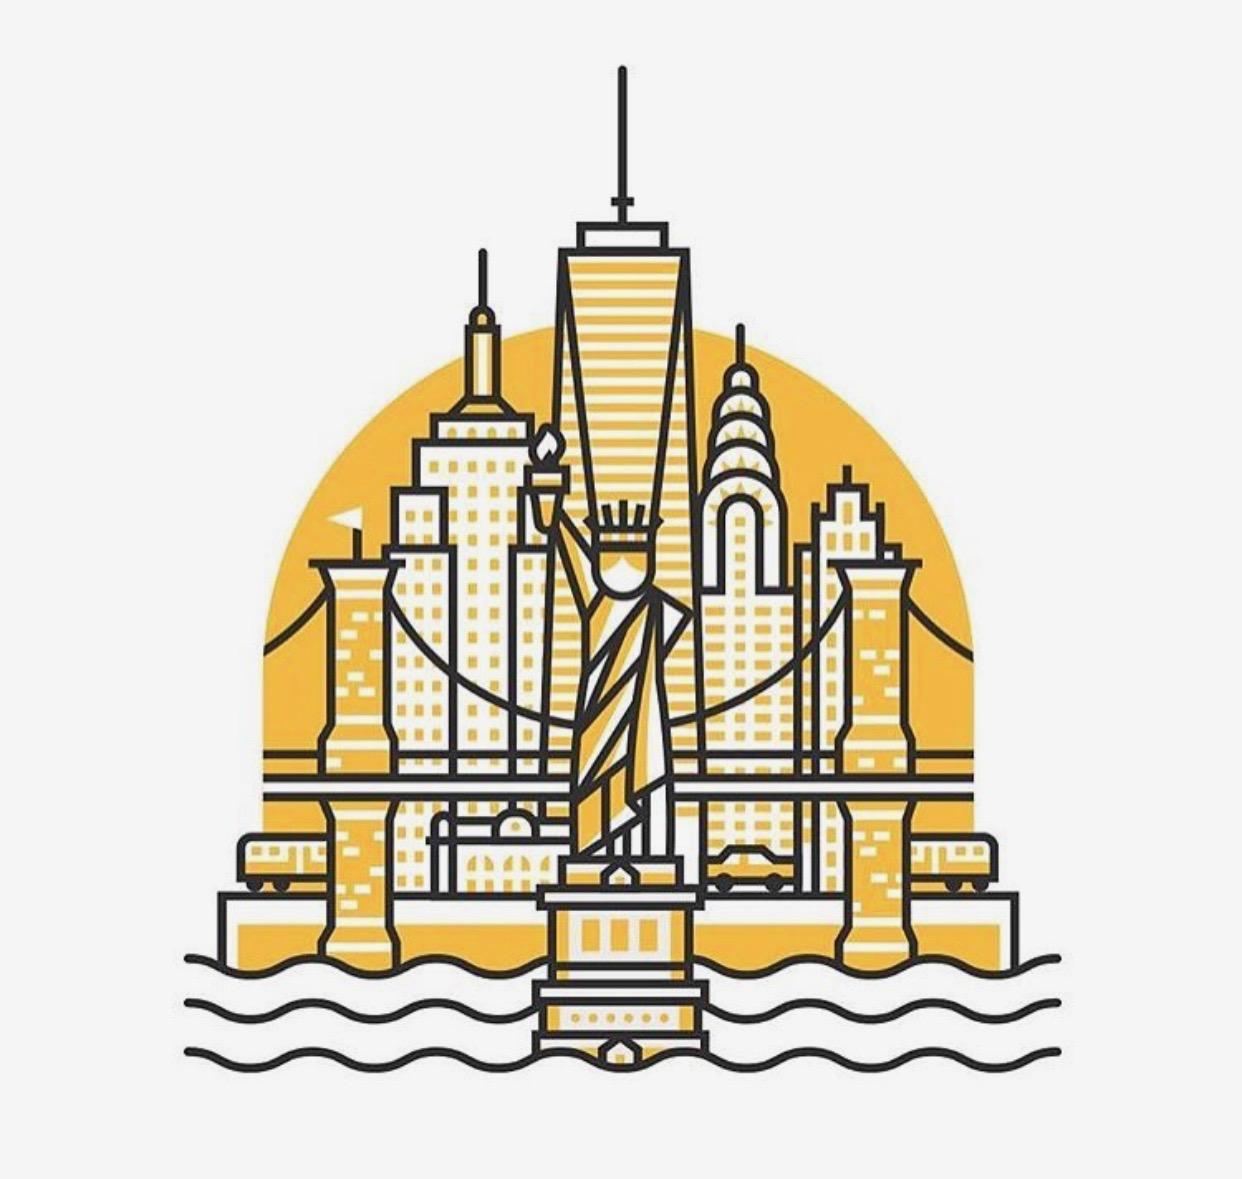 City by Kickstand